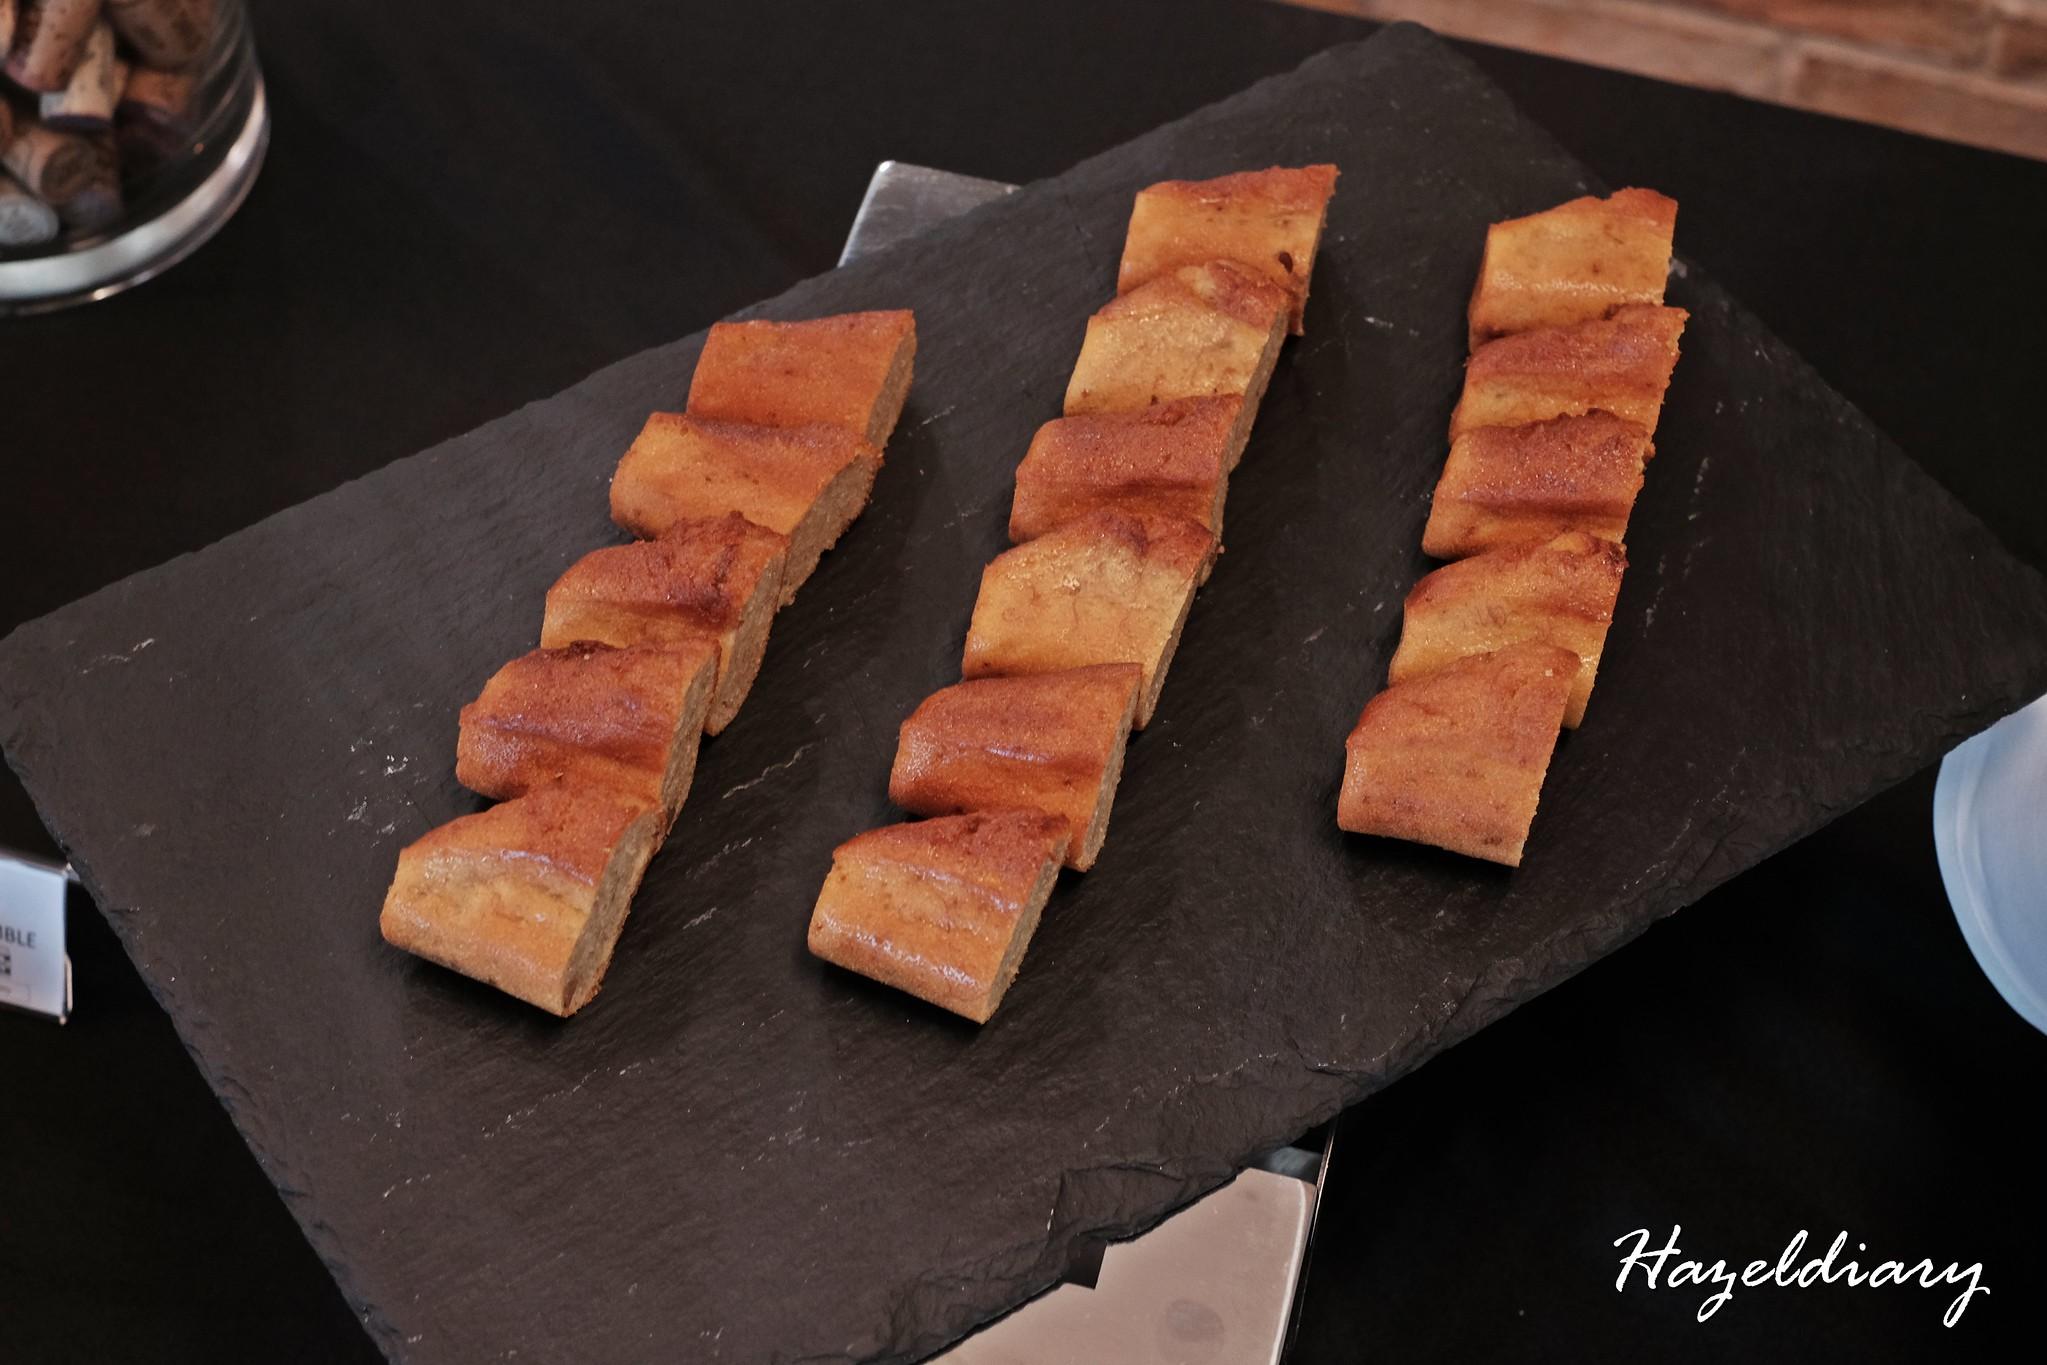 Wakanui Grill Brunch-One Marina-Dessert